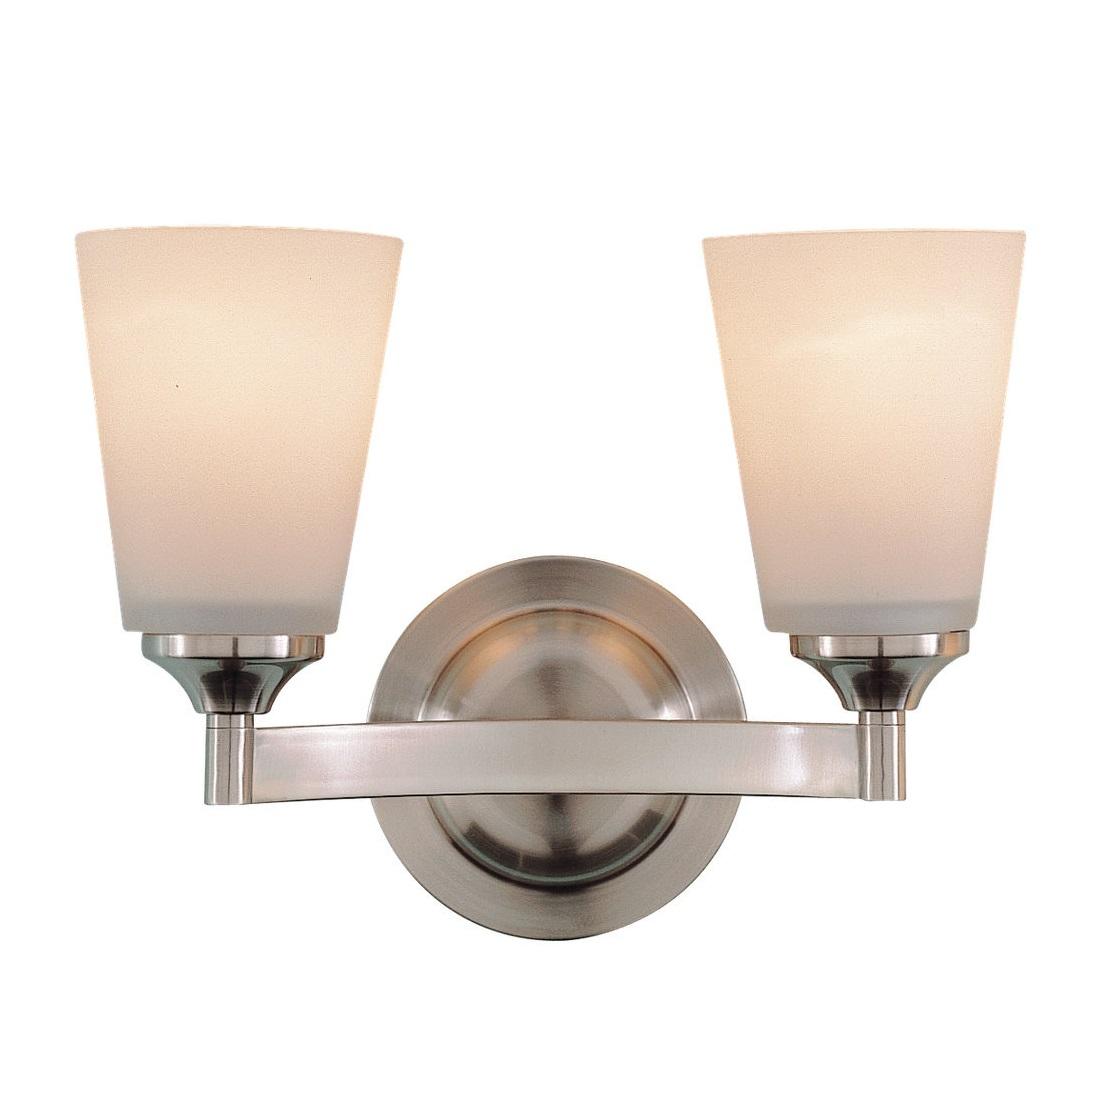 Feiss Vanity Lighting Claridge 3 Light Vanity Fixture By Feiss Feiss Vs31003 Bs Cumberland 3